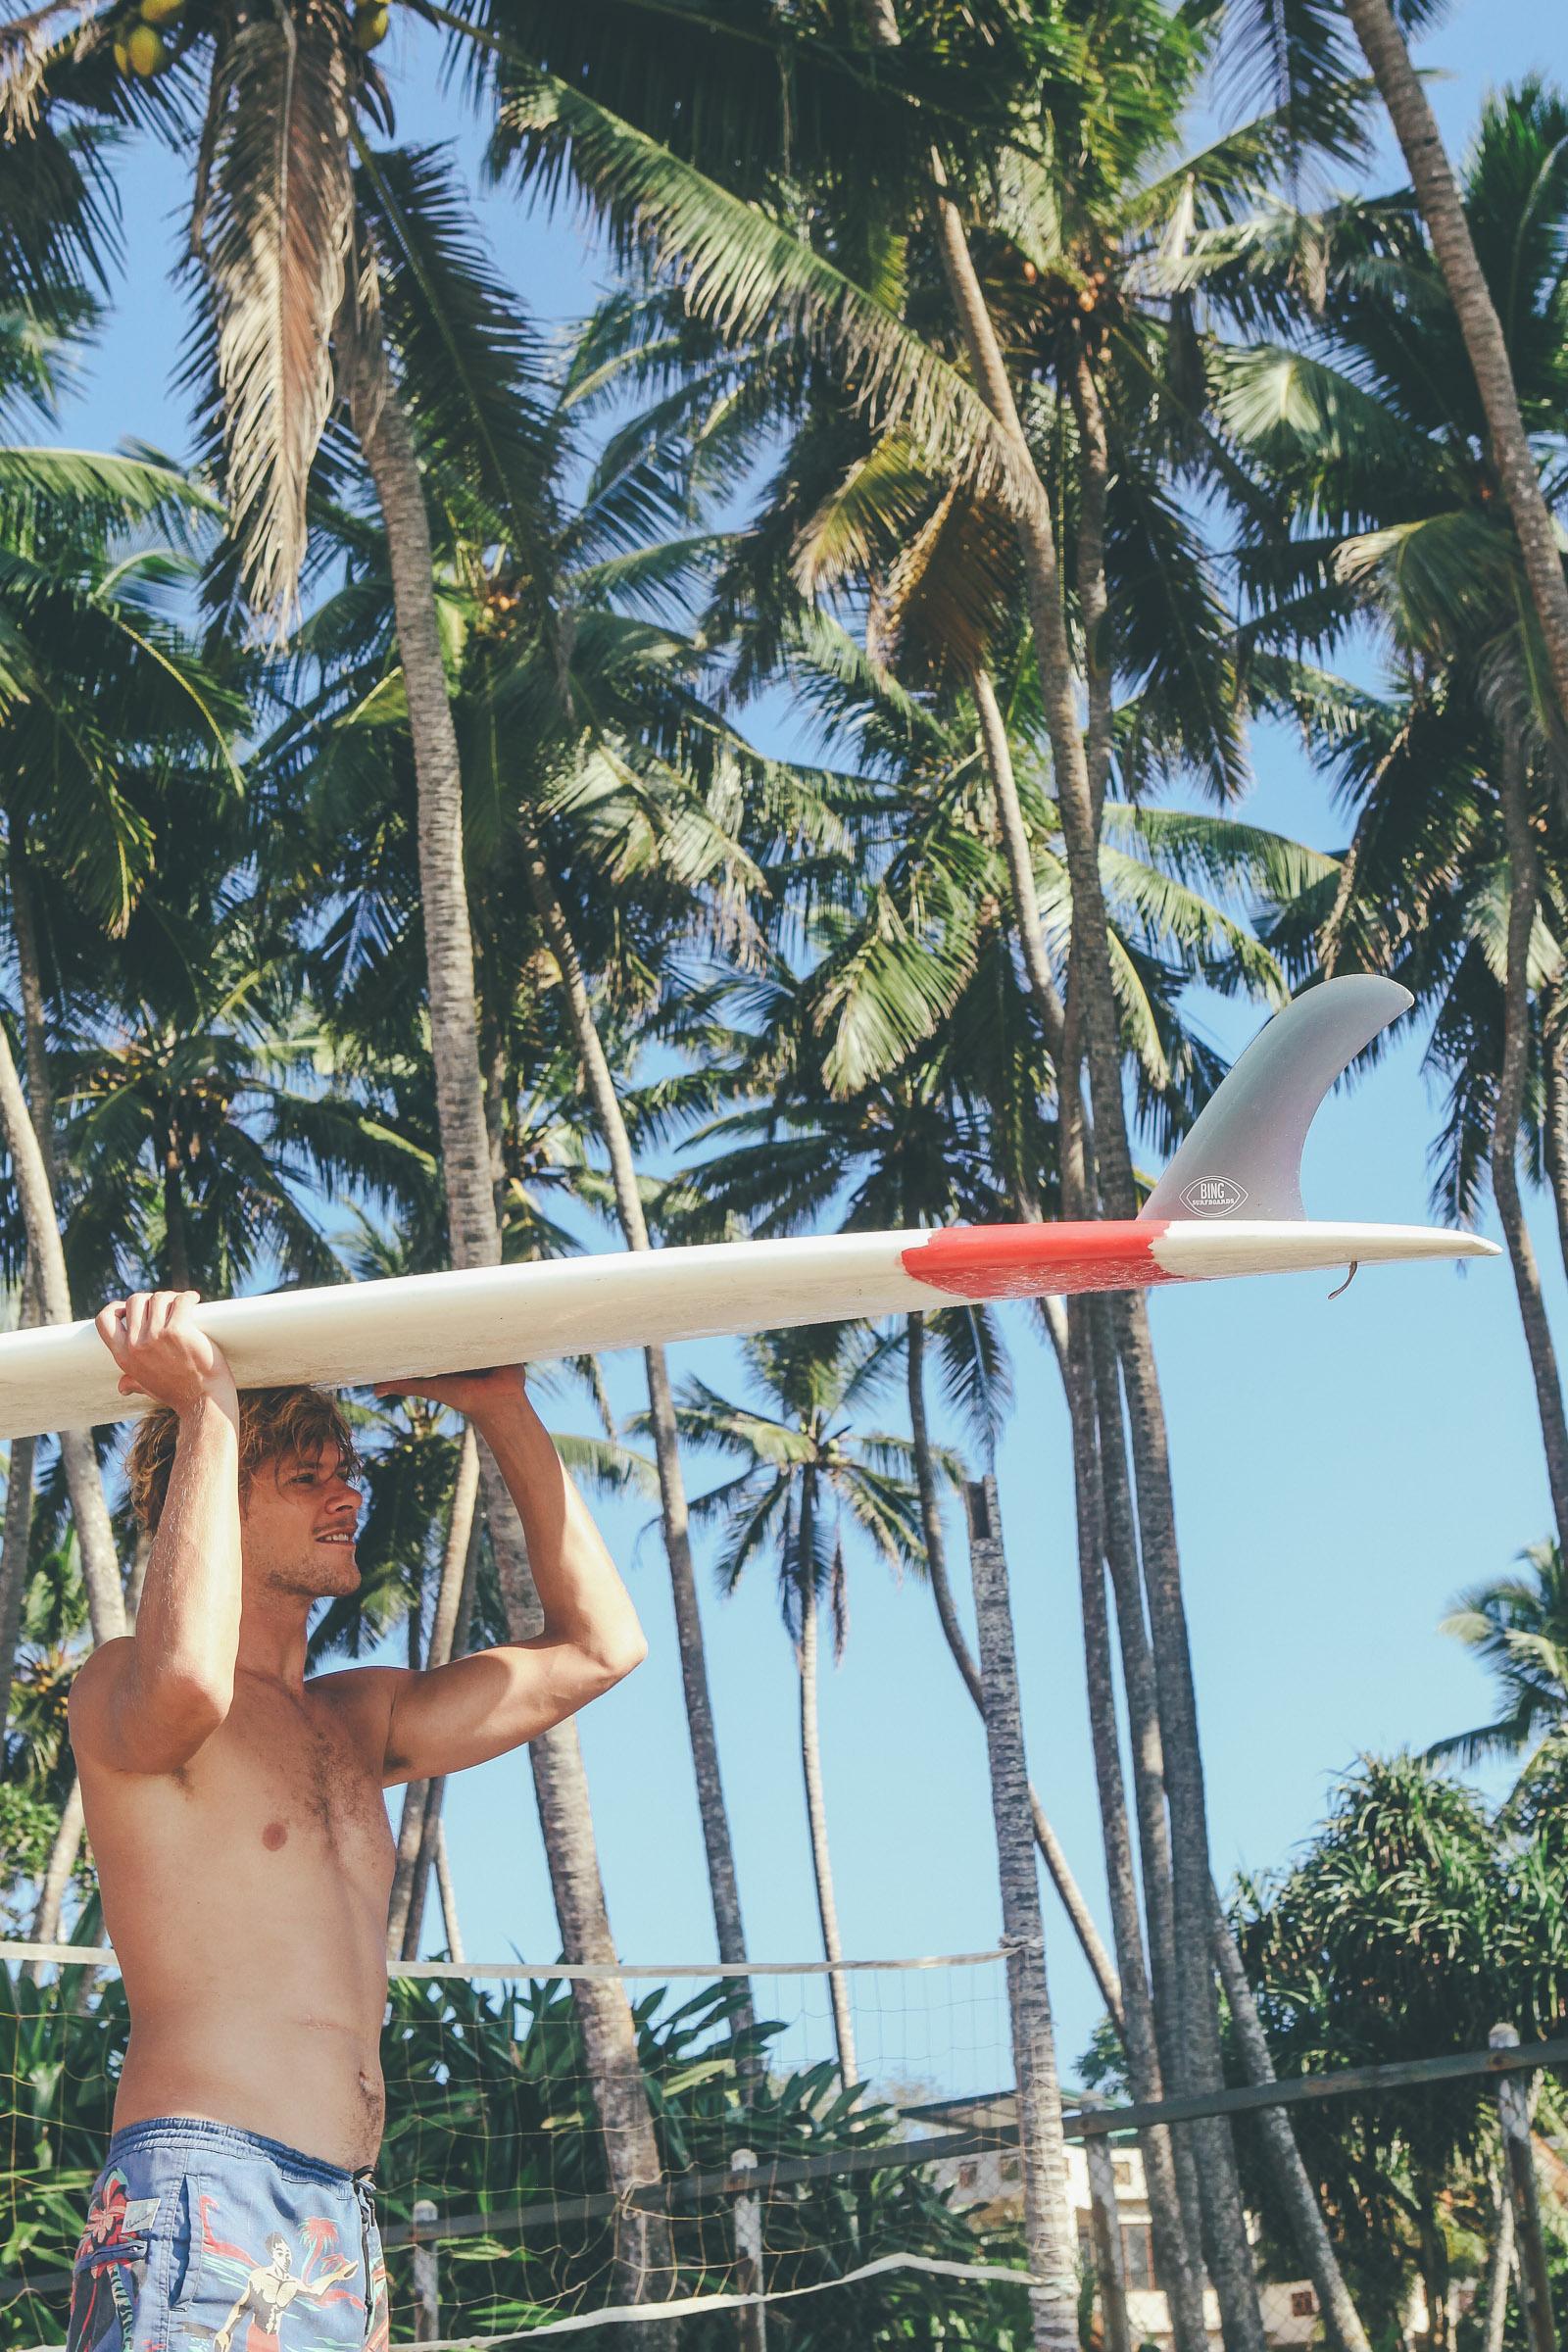 Sunshinestories-Sri-Lanka-Medawatta-Medawata-Meda-Watta-Mada-surf-Lonboard-Surfing-Wave-Surf-School-Camp-Yoga-Studio-IMG_0855